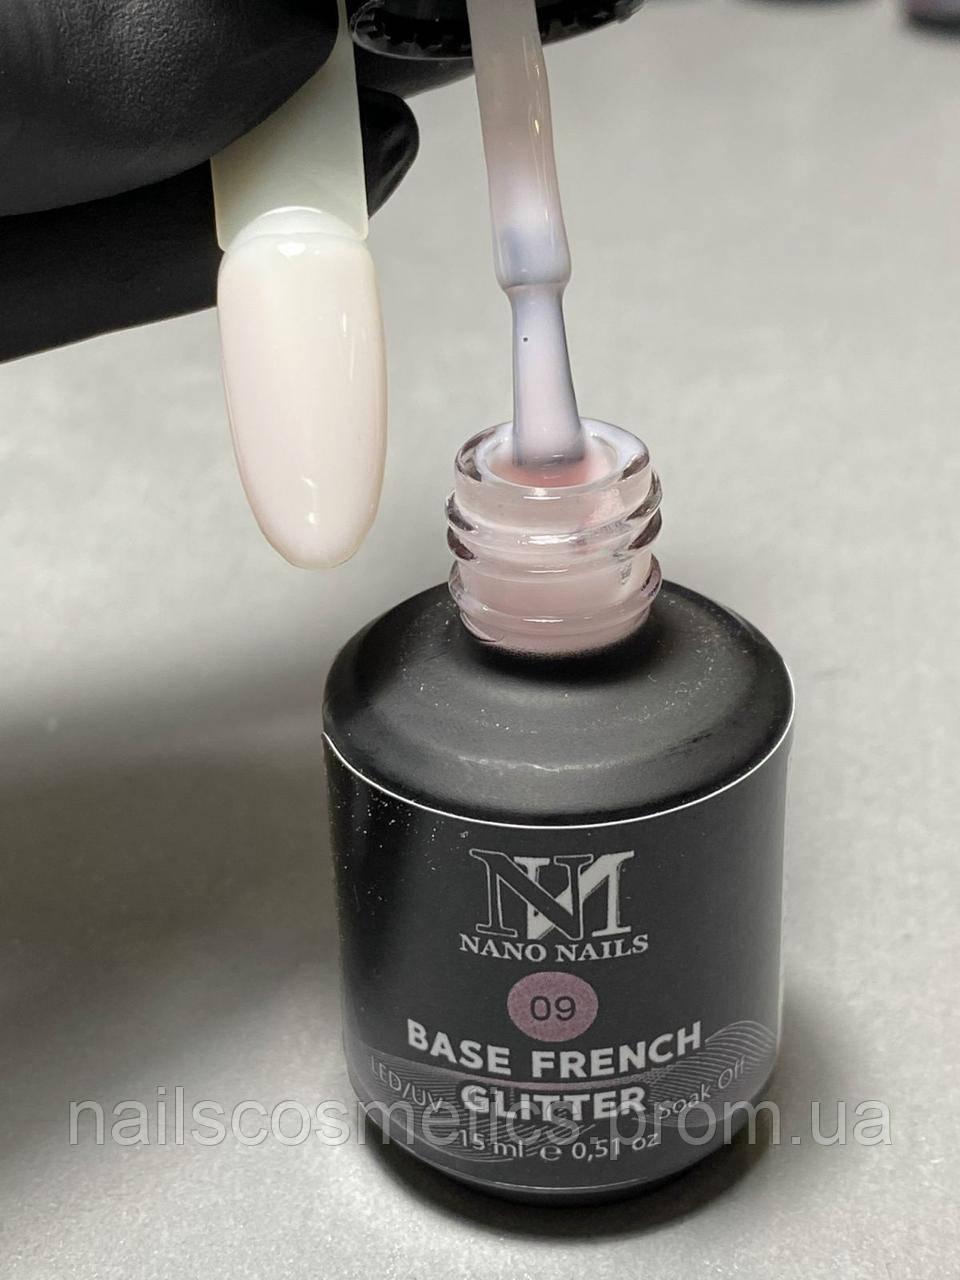 09 Base French glitter NANO NAILS, для гель-лака 14мл